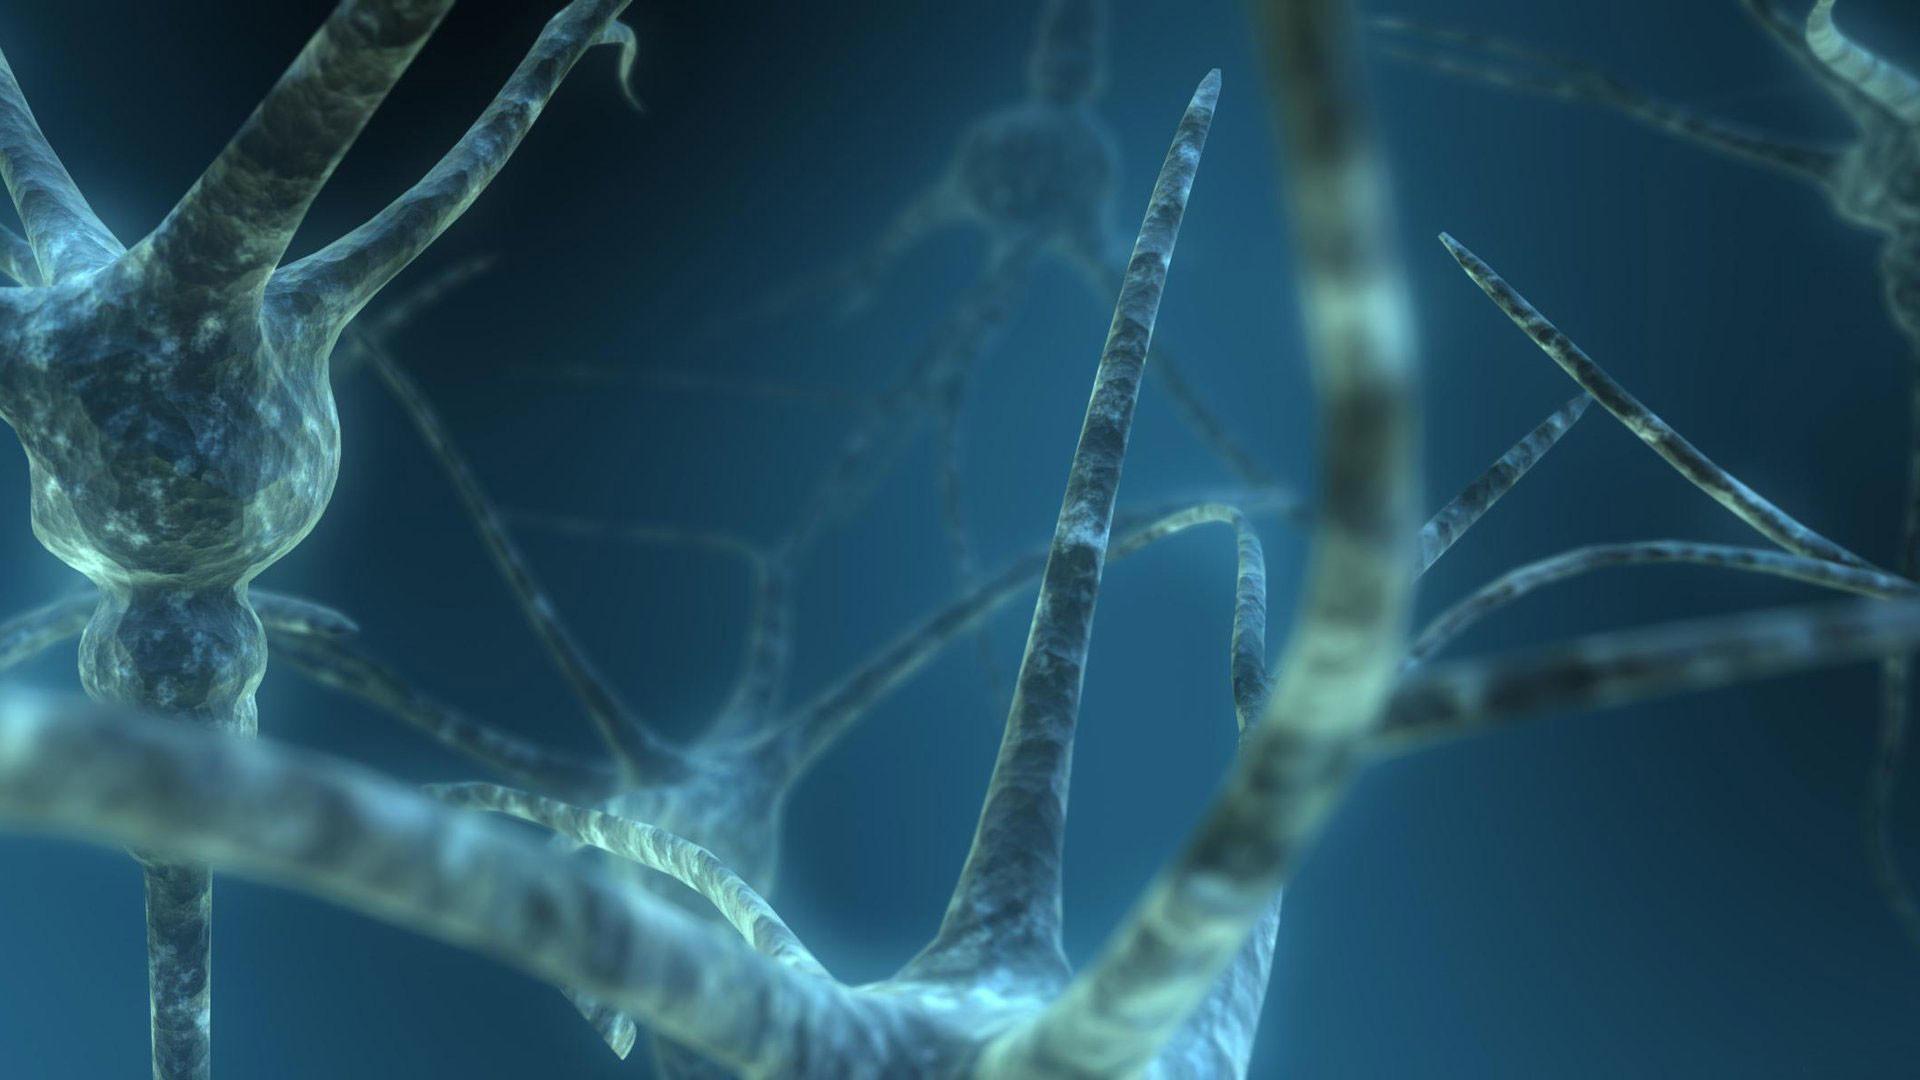 hd pics photos stunning brain cells circuit neurons 3d macro hd quality  desktop background wallpaper